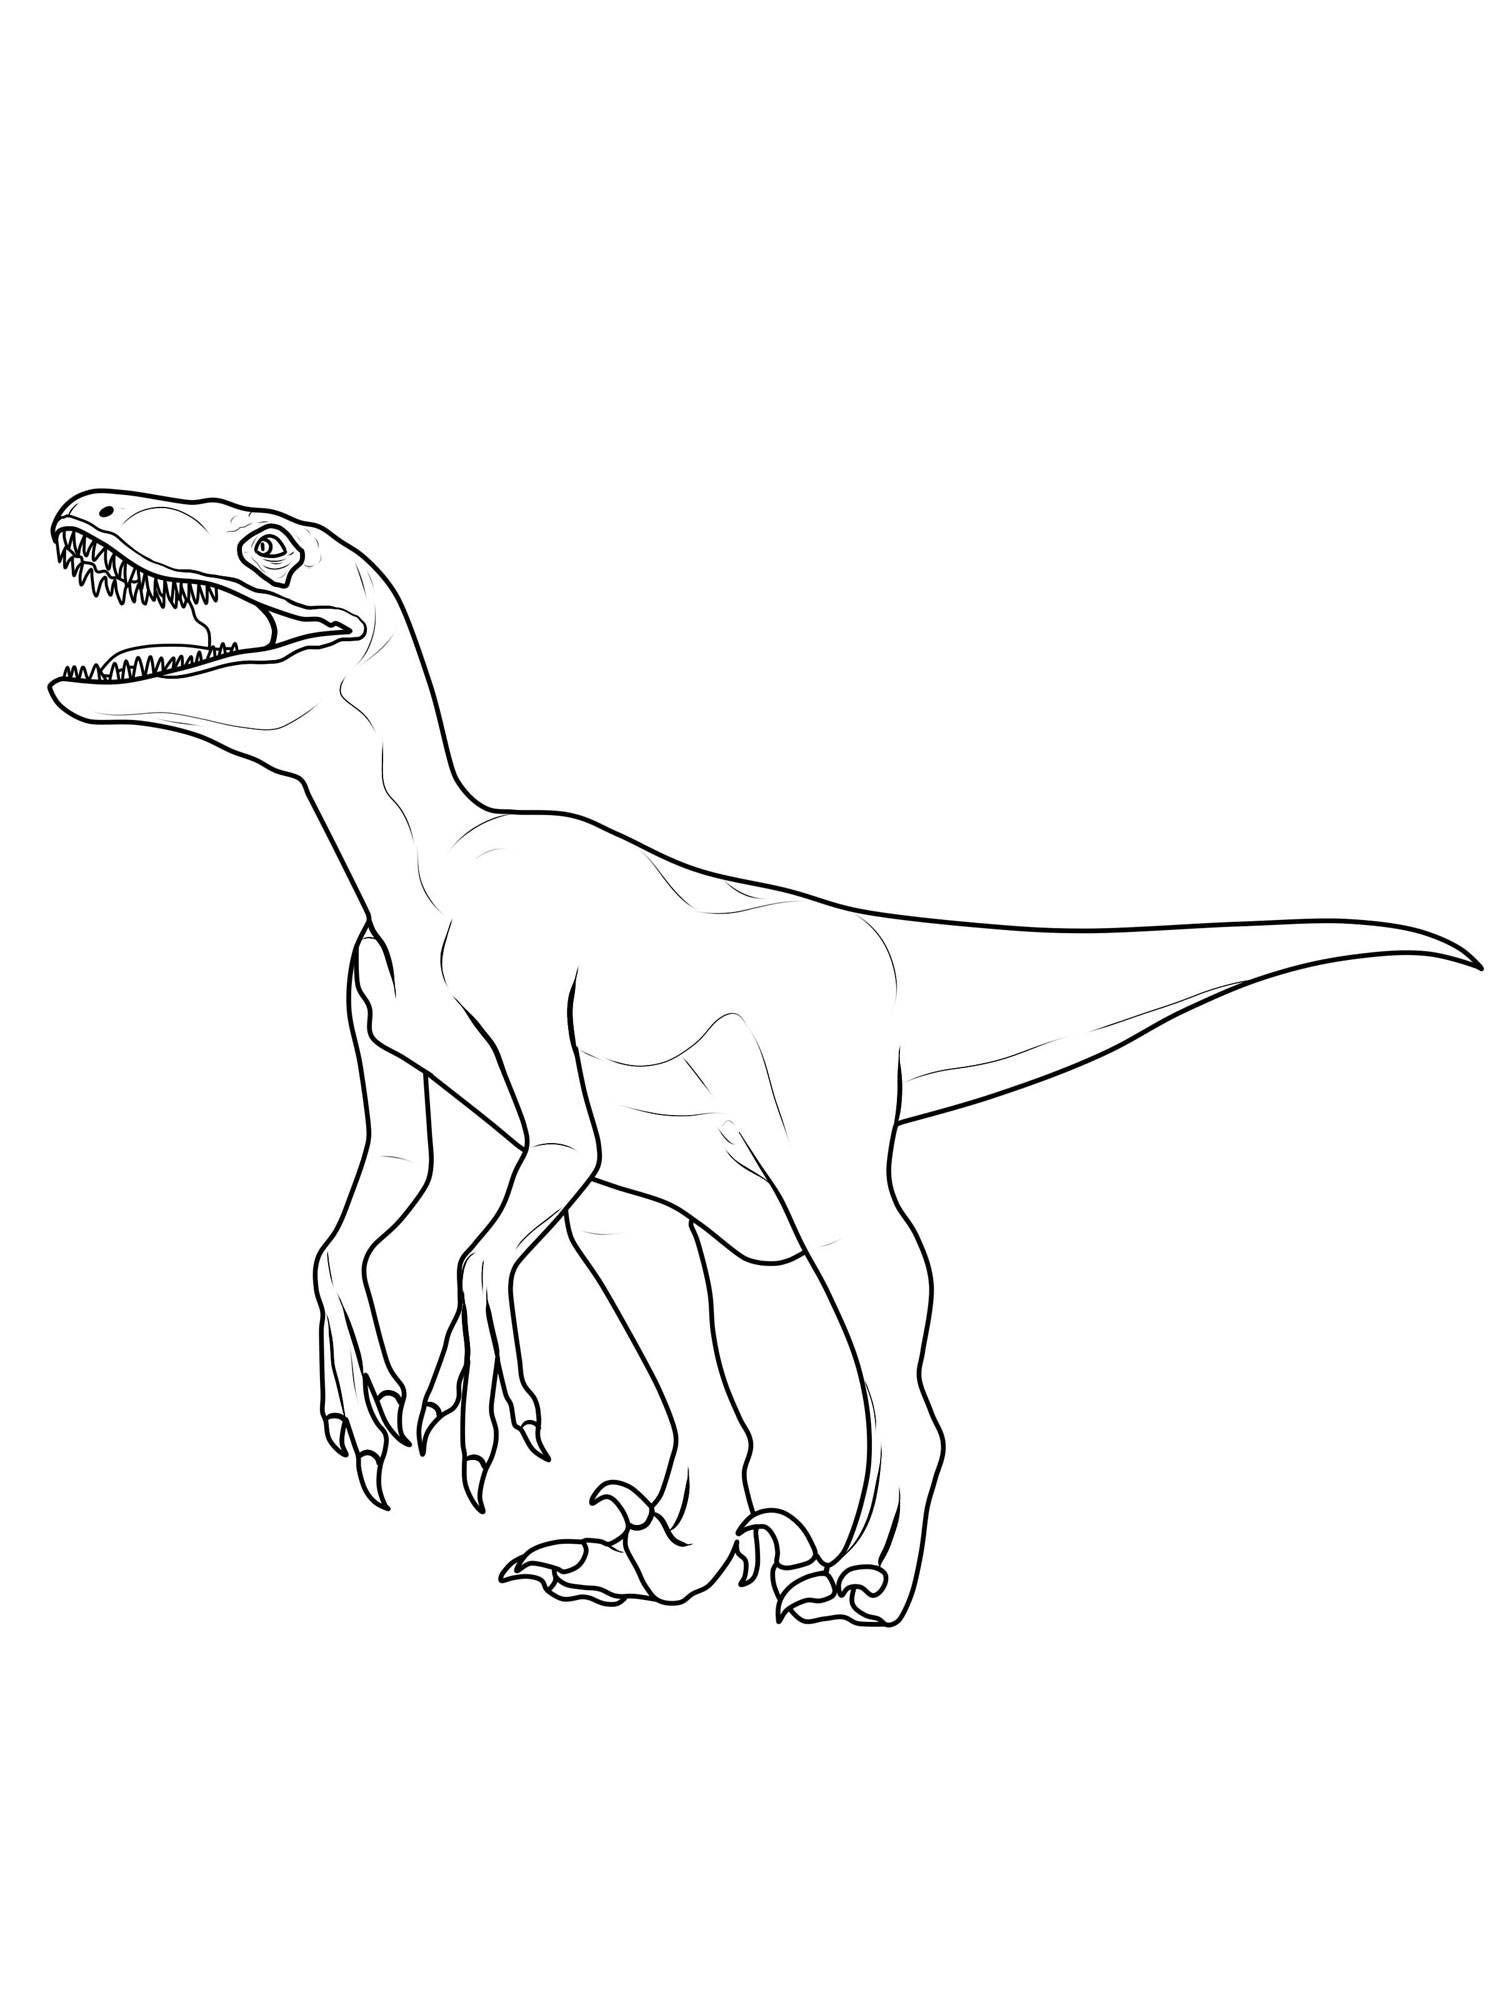 Velociraptor Ausmalbilder Ausmalbilder Velociraptor Malvorlagen Ausmalen Ausmalbilder